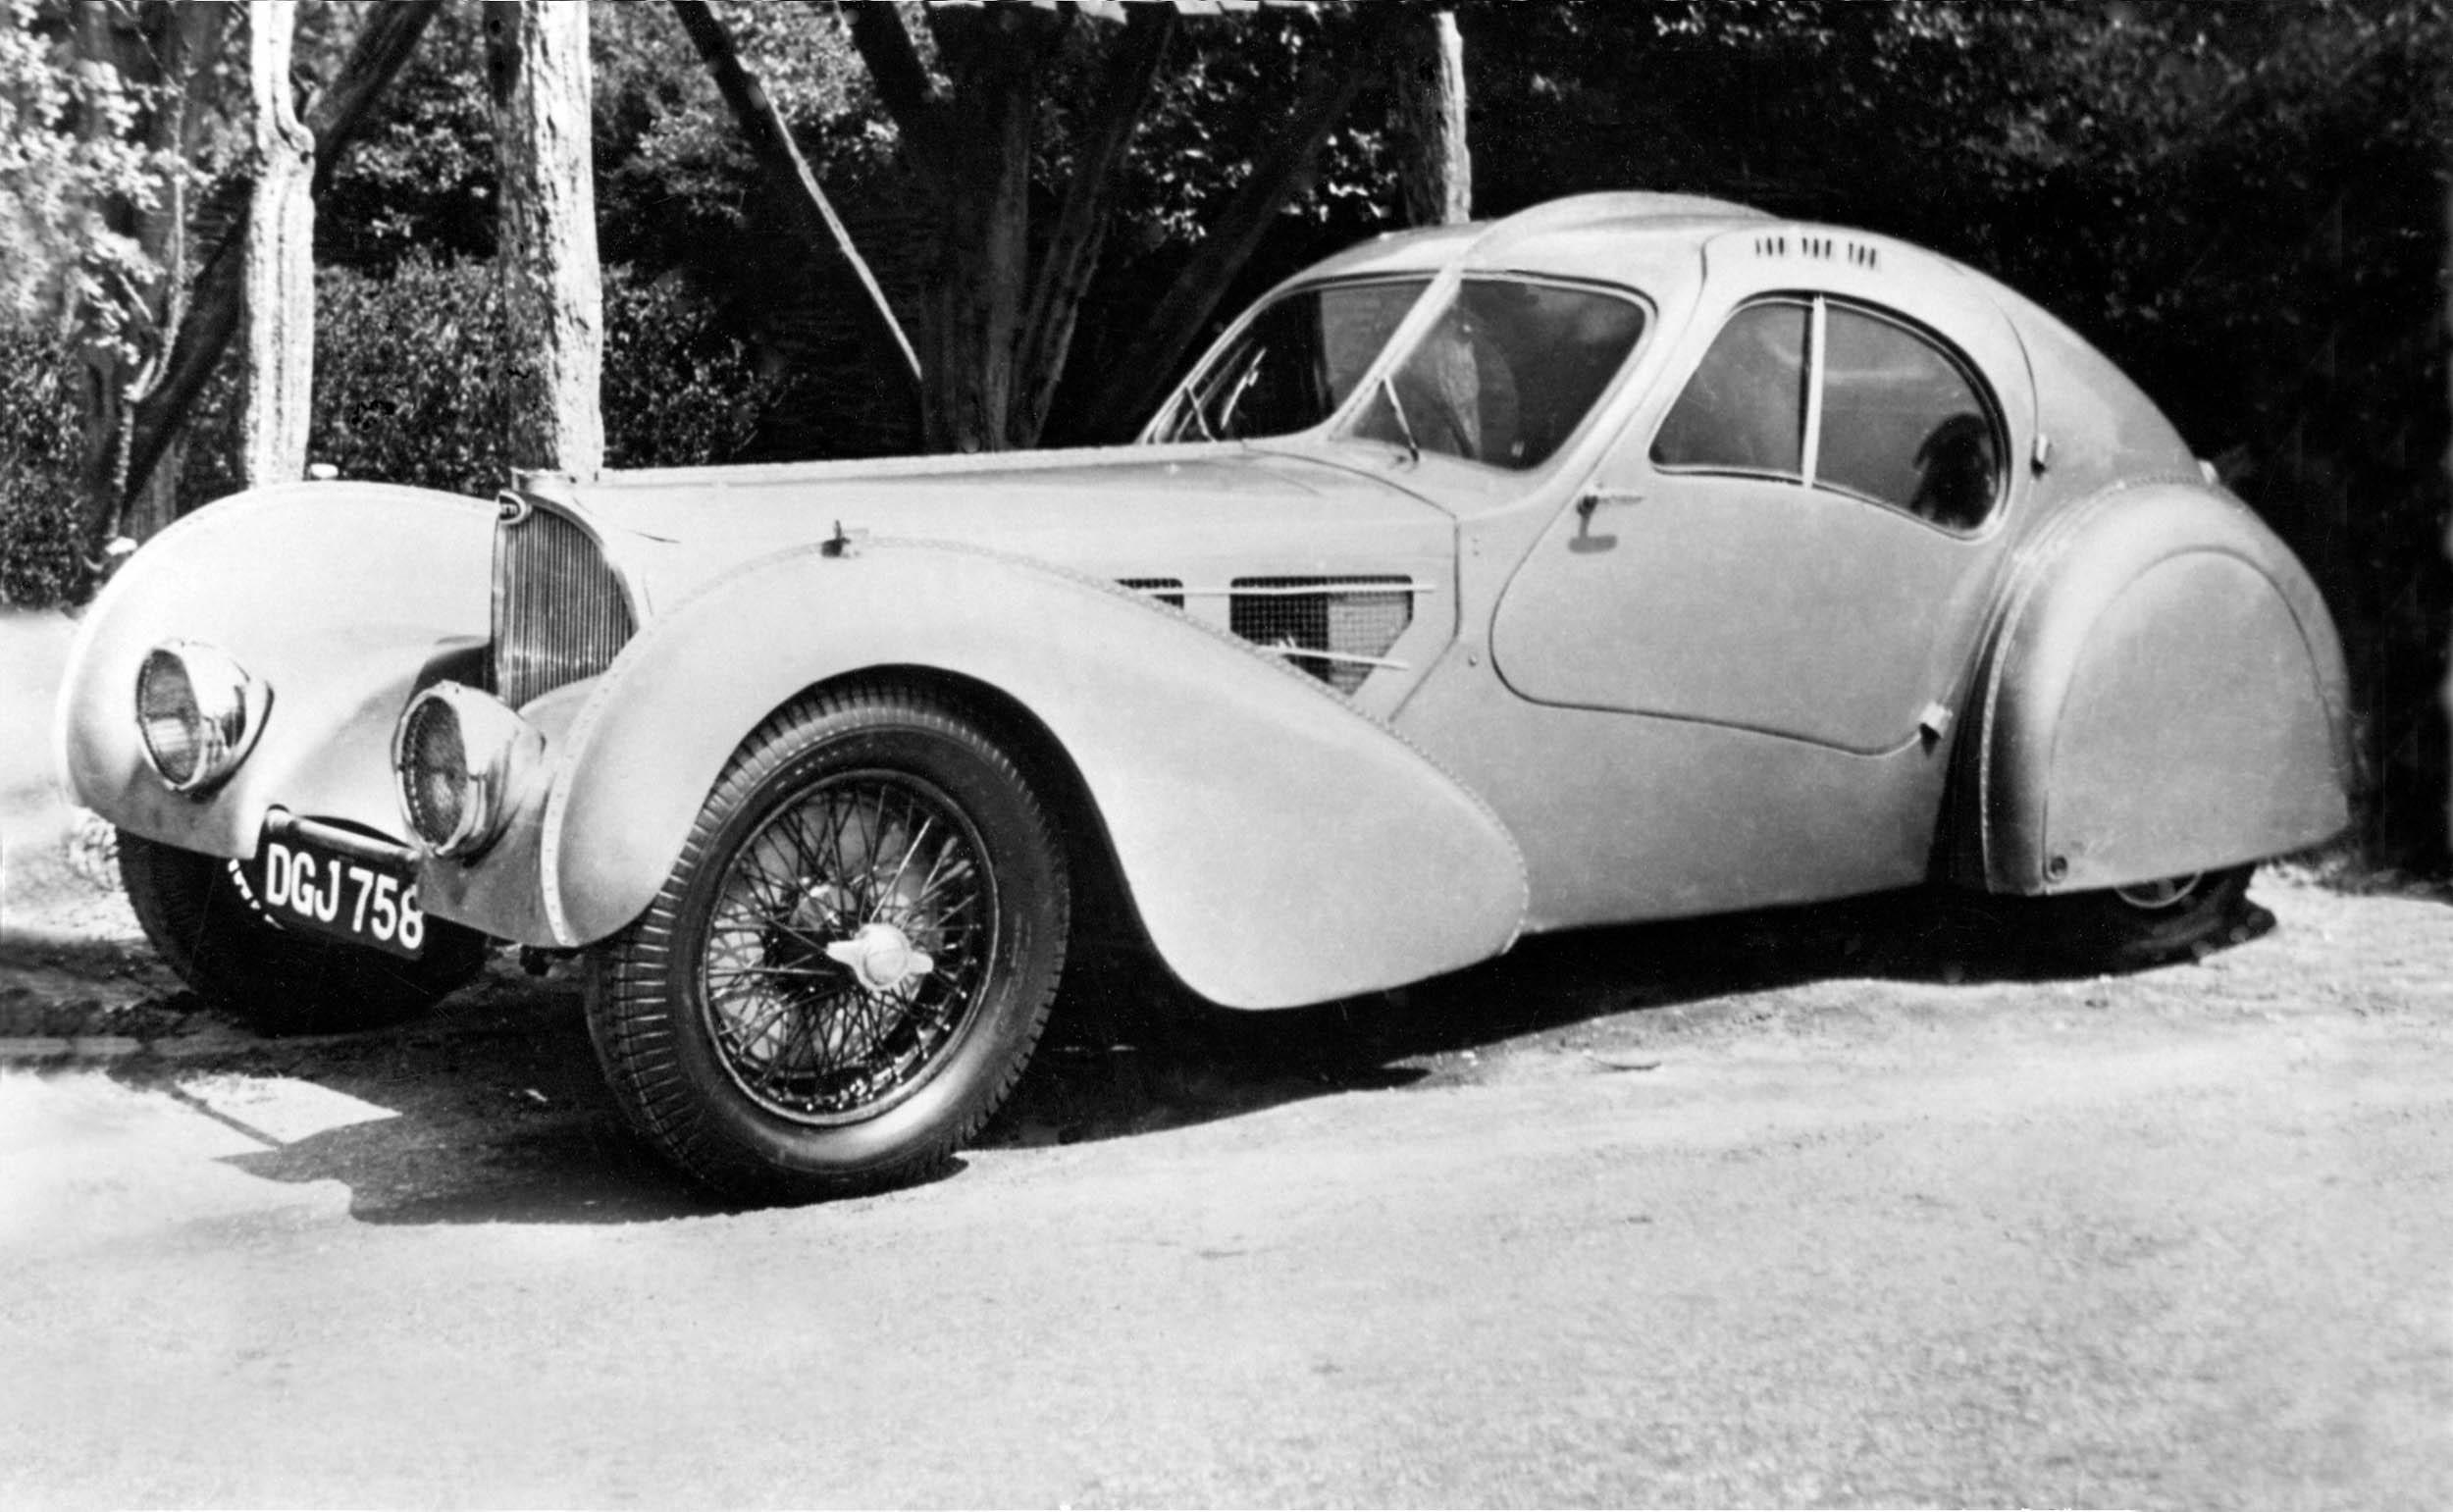 1935 Bugatti Atlantic Rothschild Car